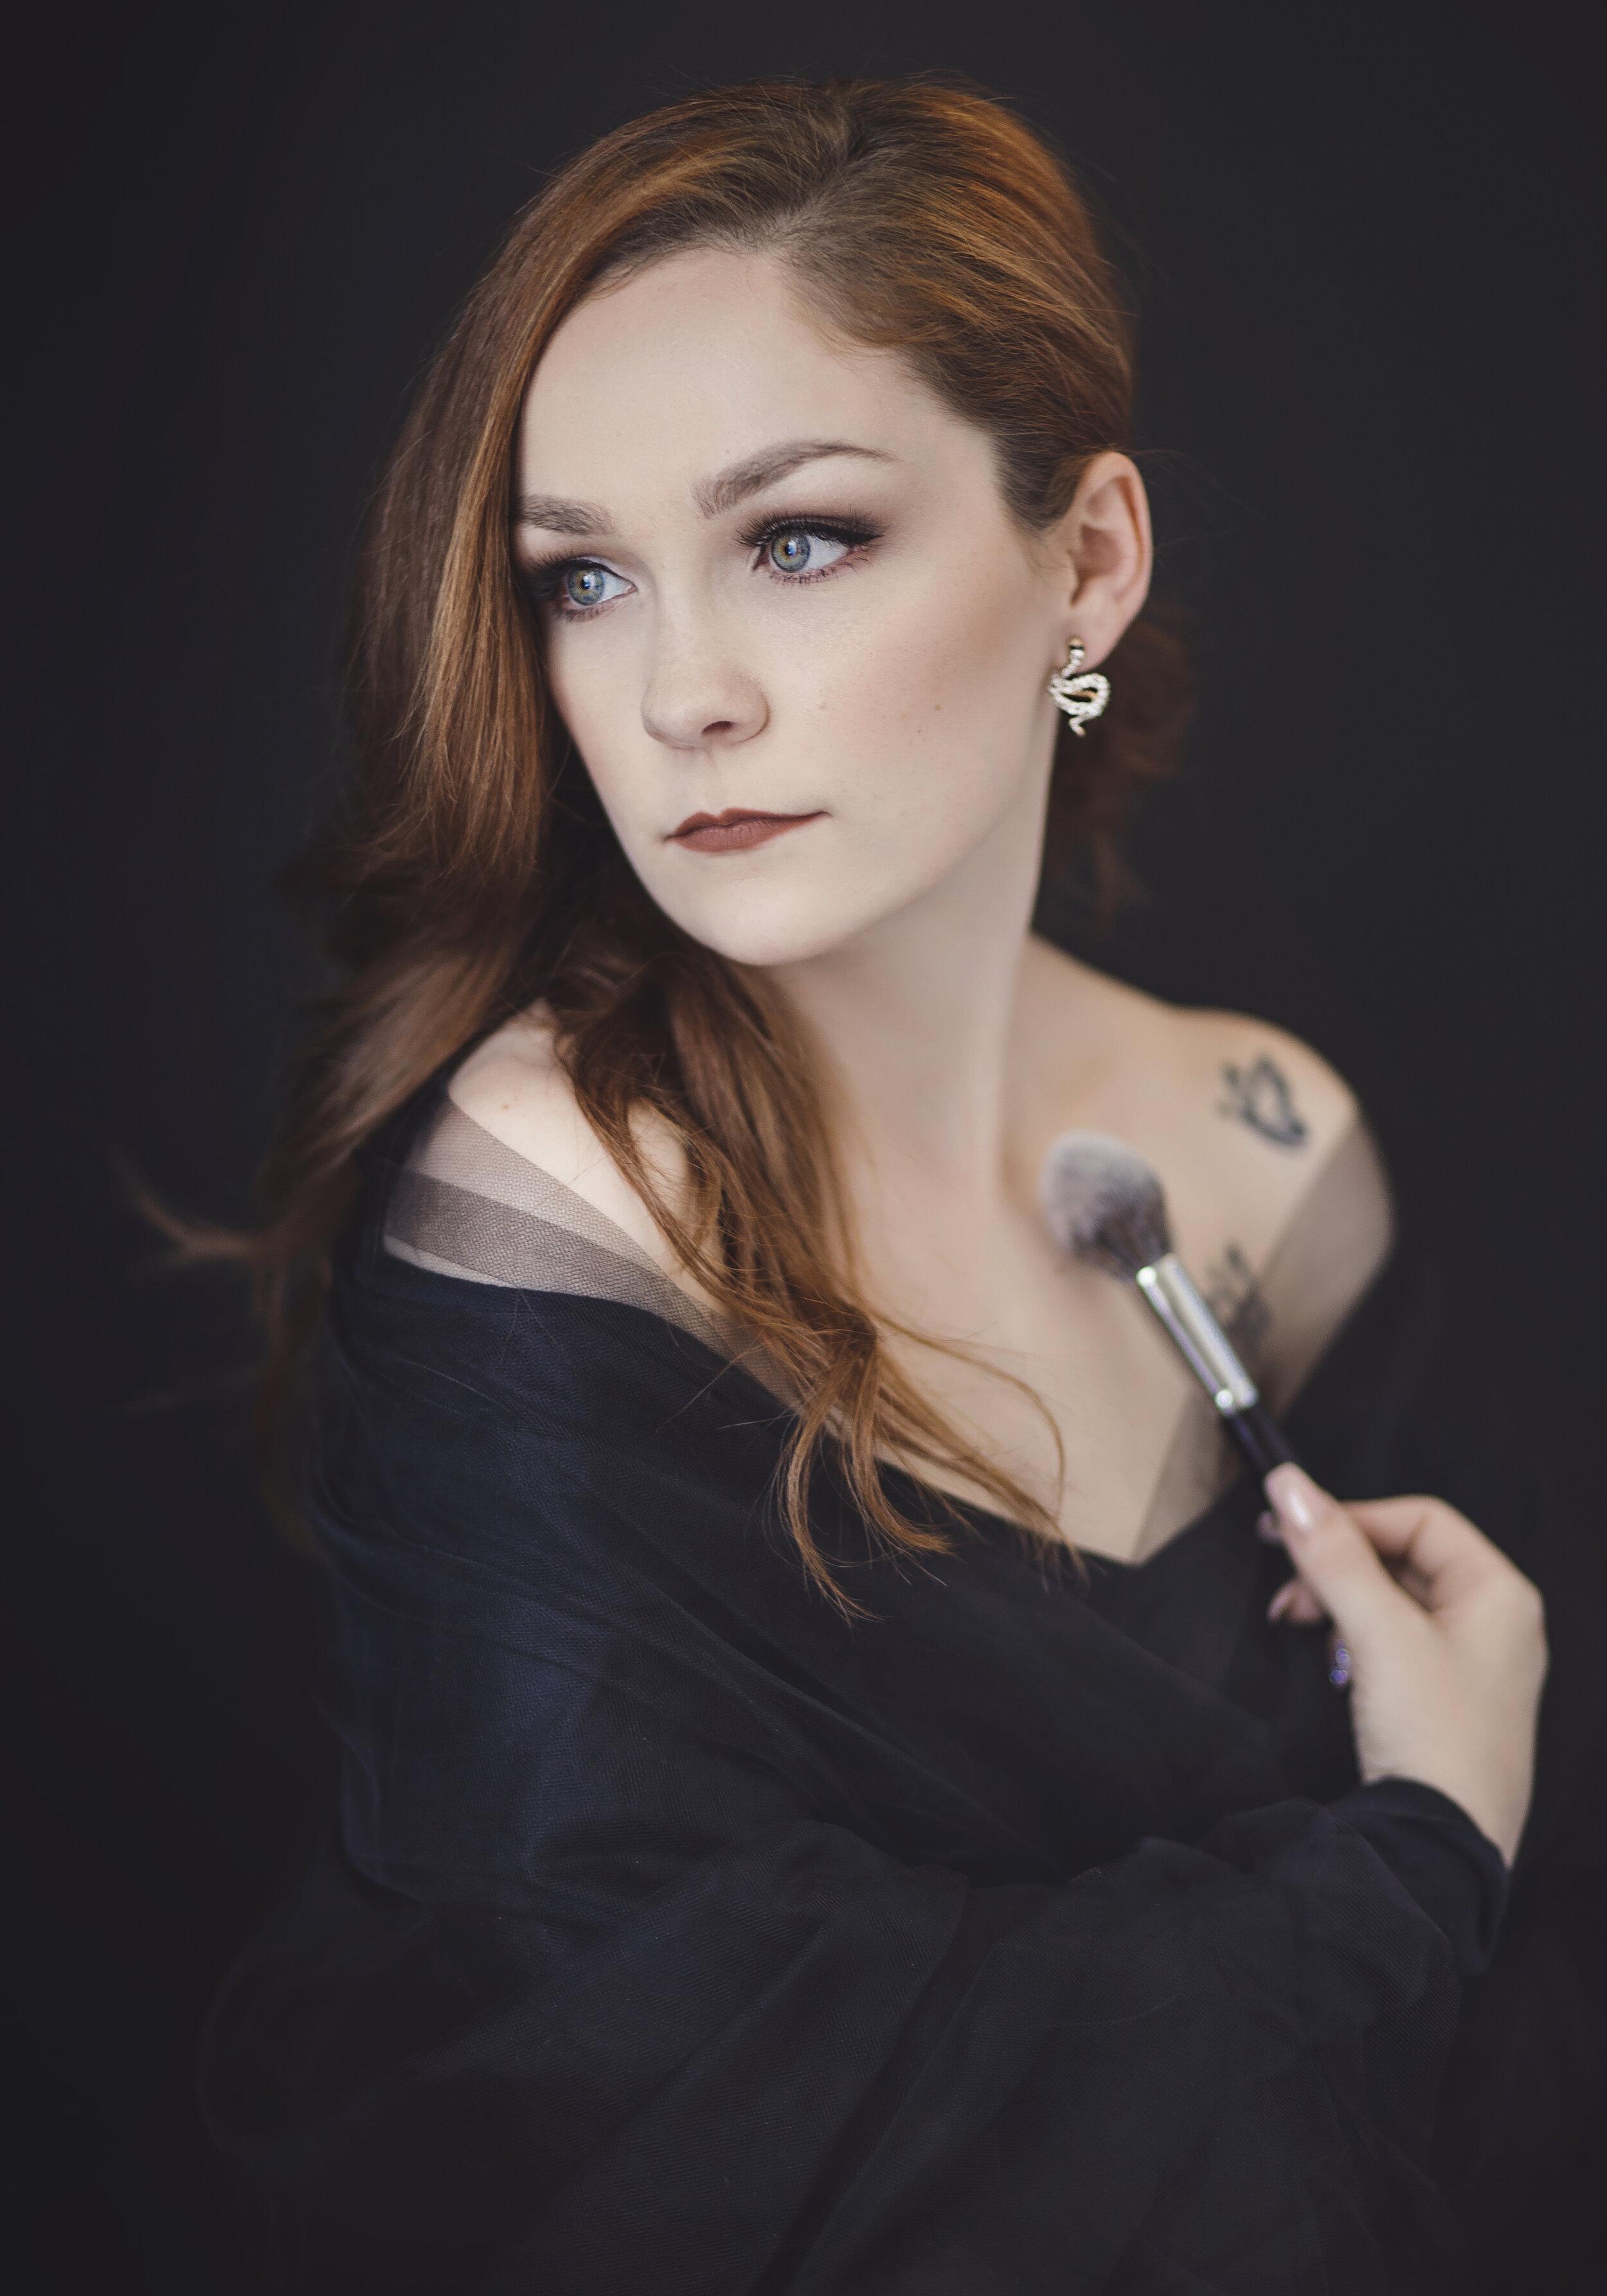 Robin, Makeover Artist